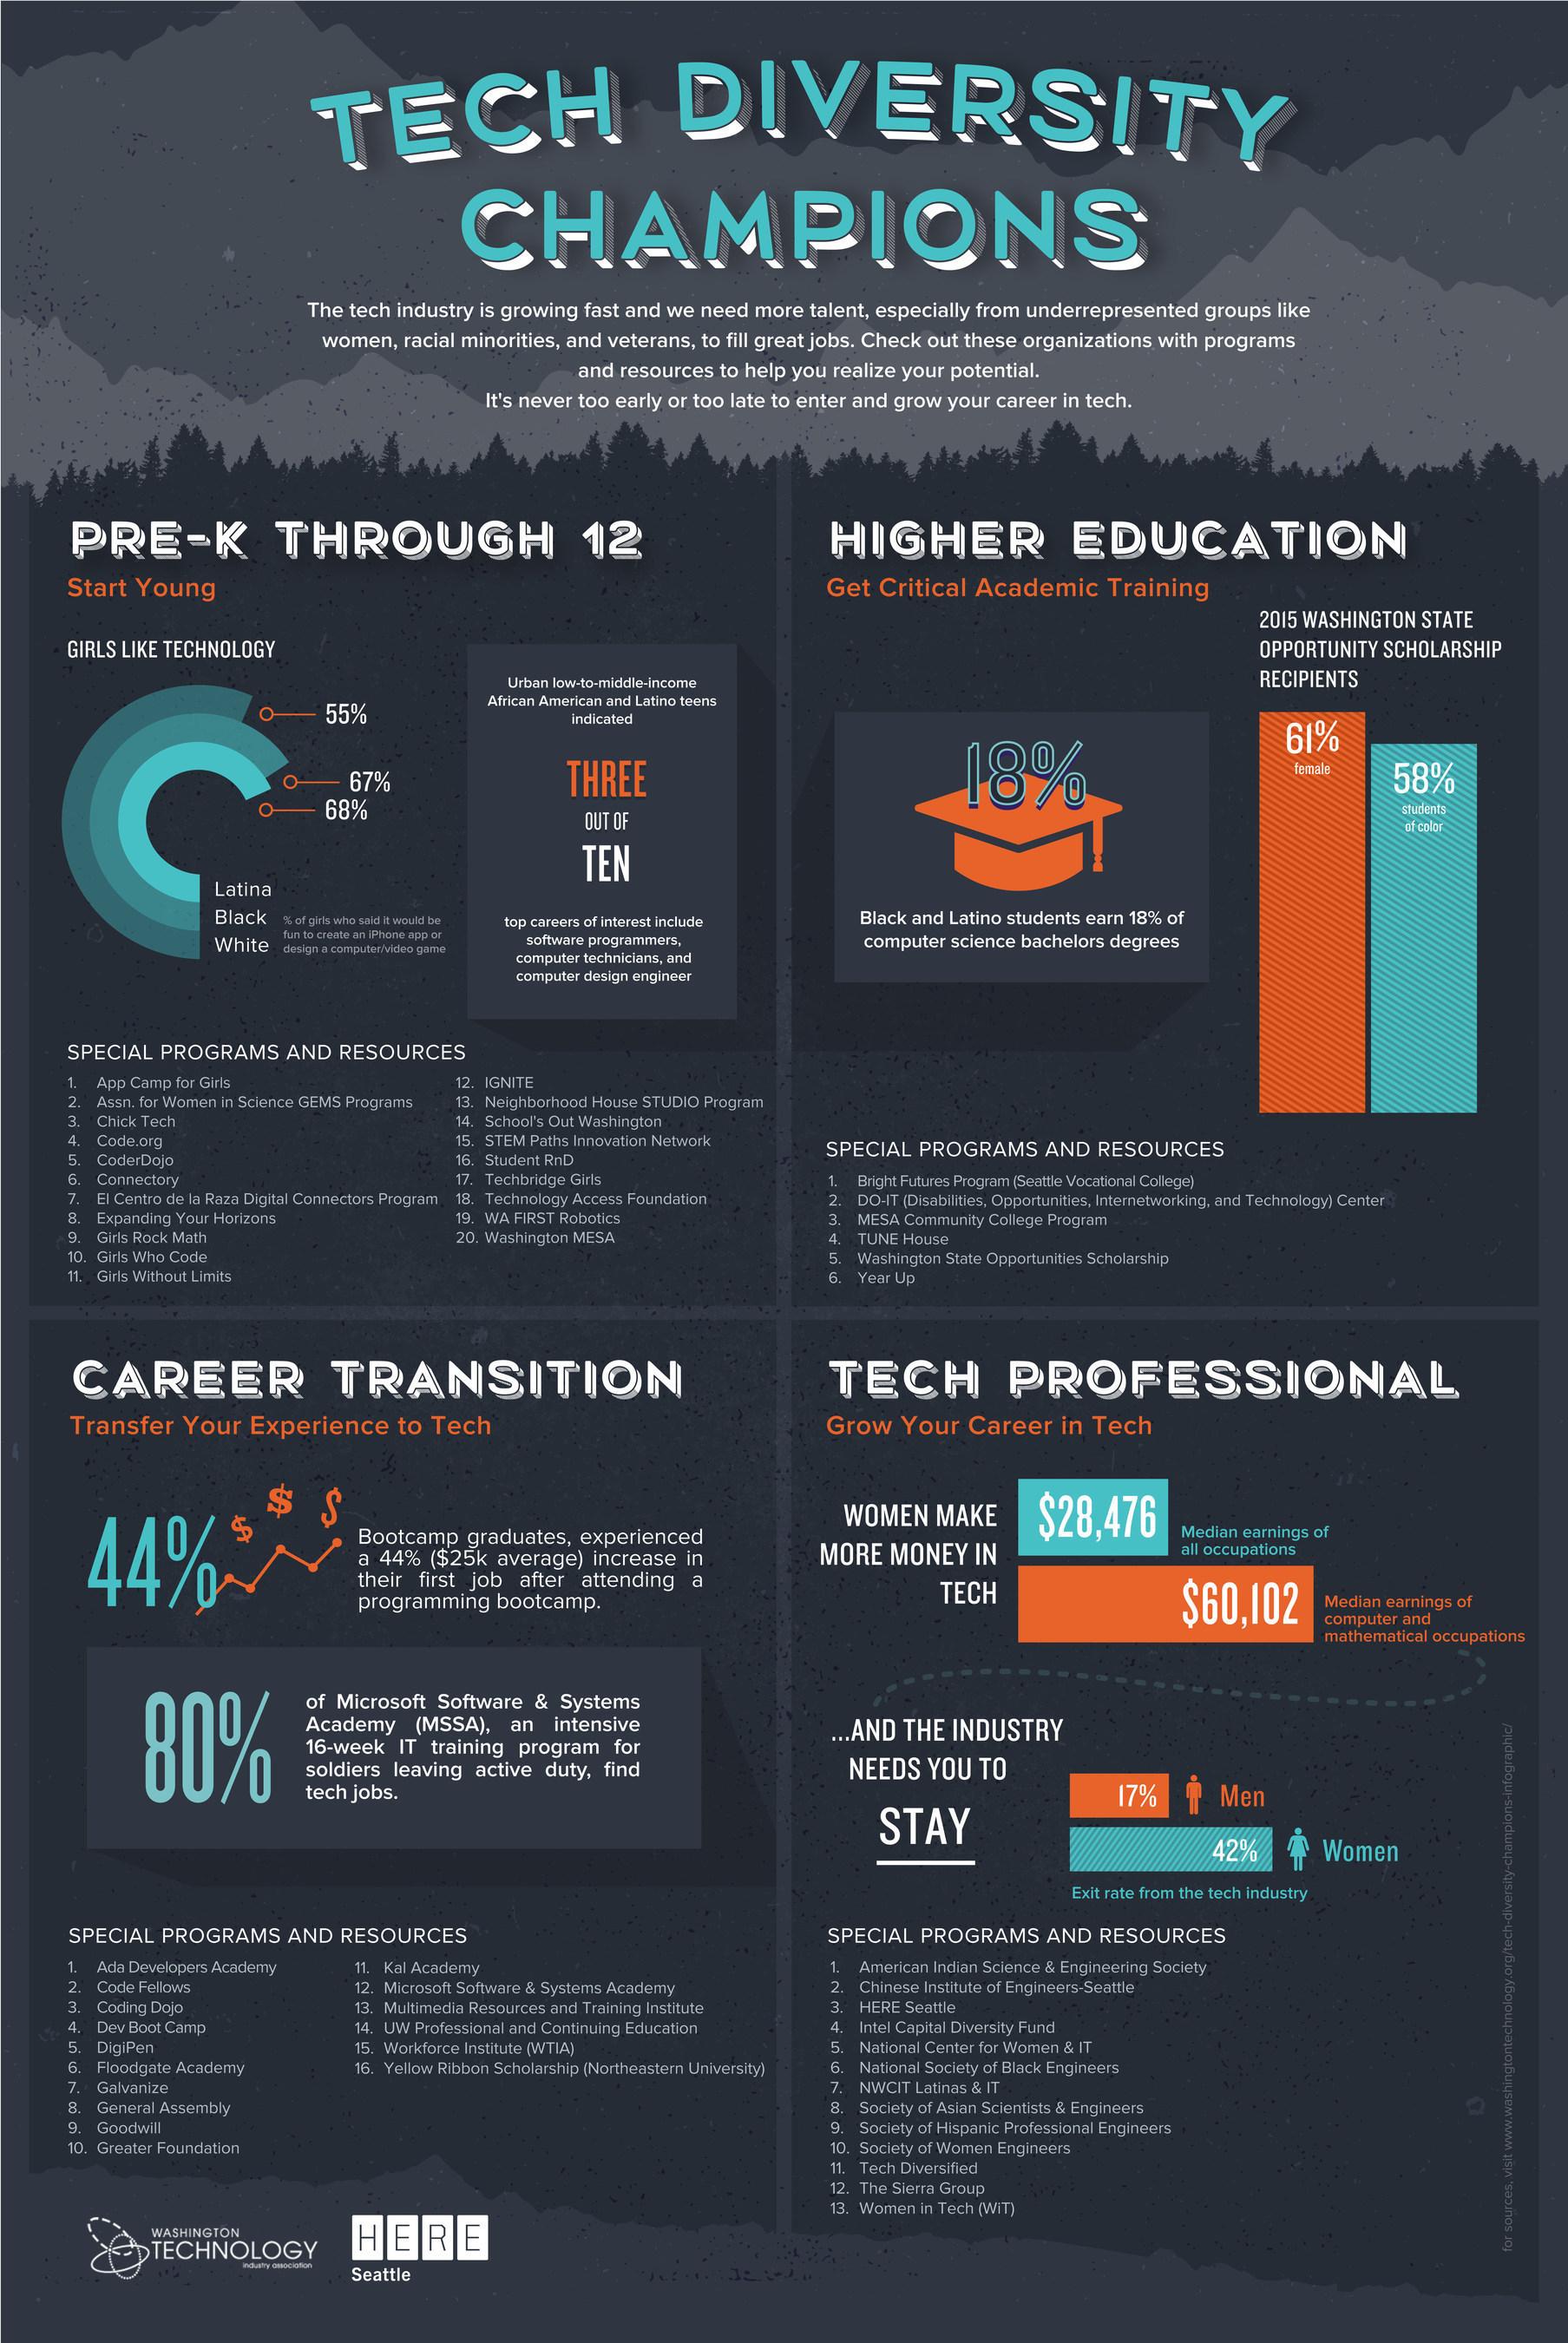 WTIA_Tech_Diversity_Champions_Infographic